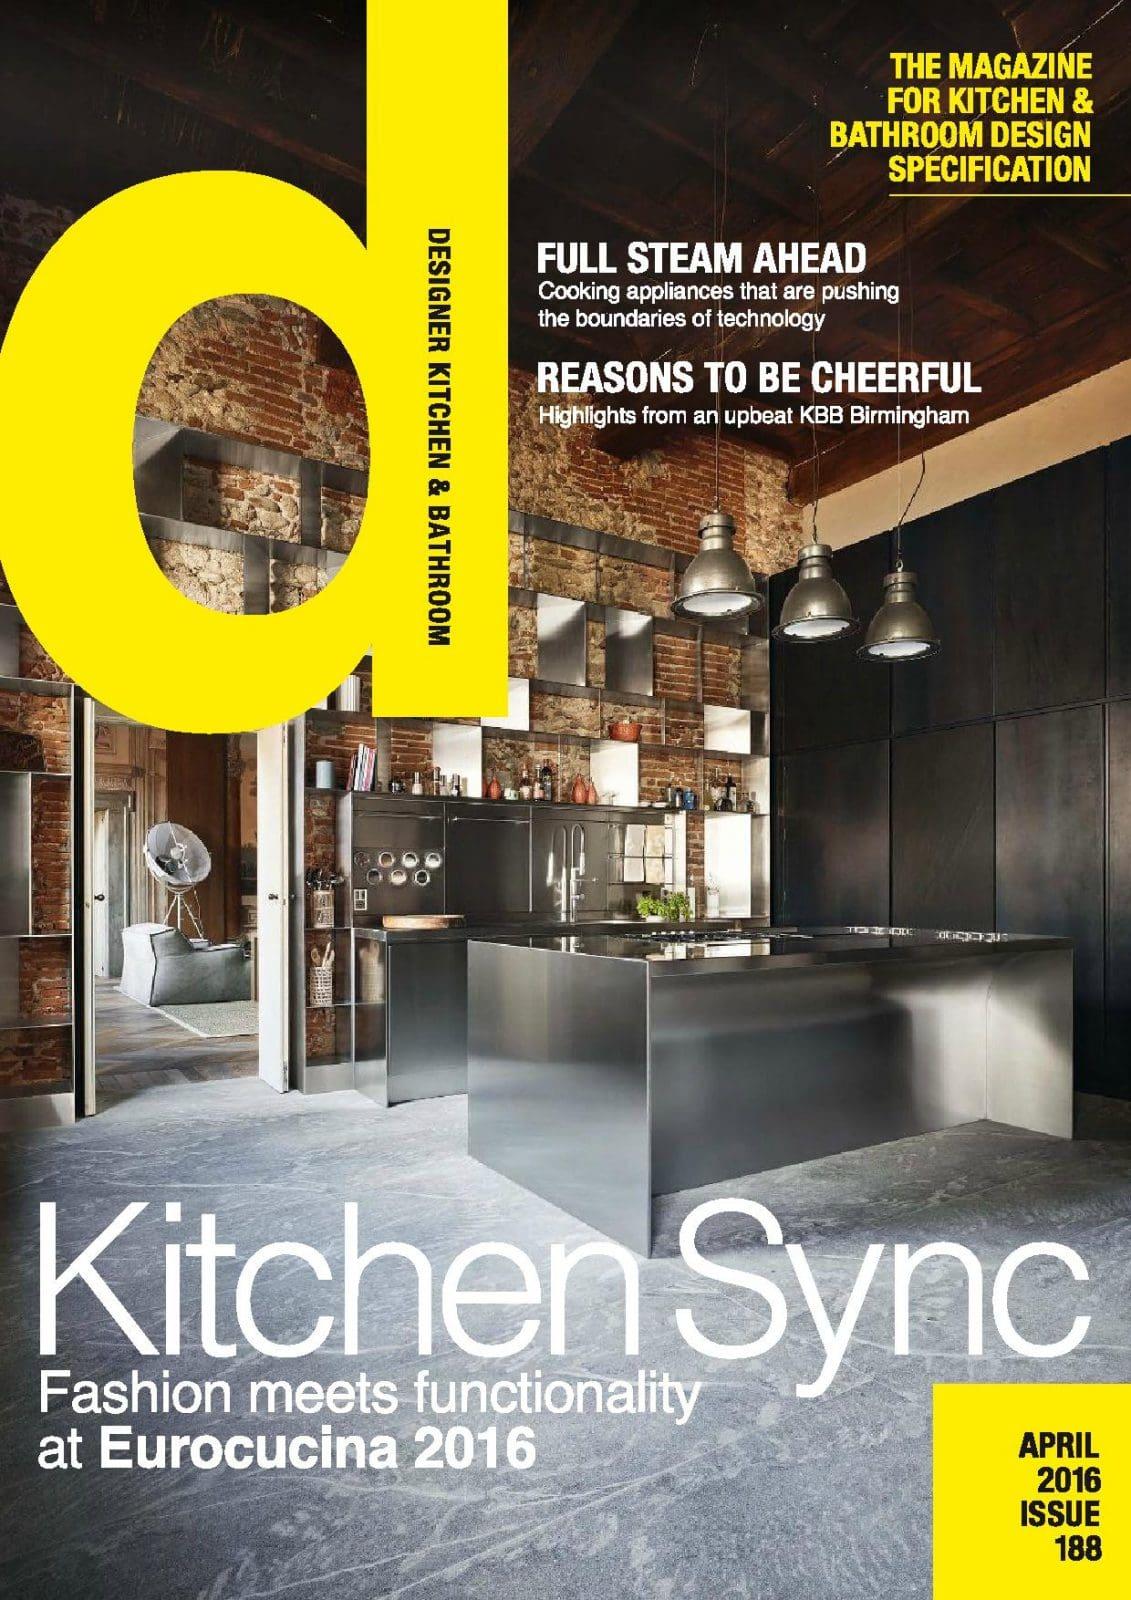 Stupendous Designer Kitchen And Bathroom April 2016 Higham Furniture Download Free Architecture Designs Scobabritishbridgeorg